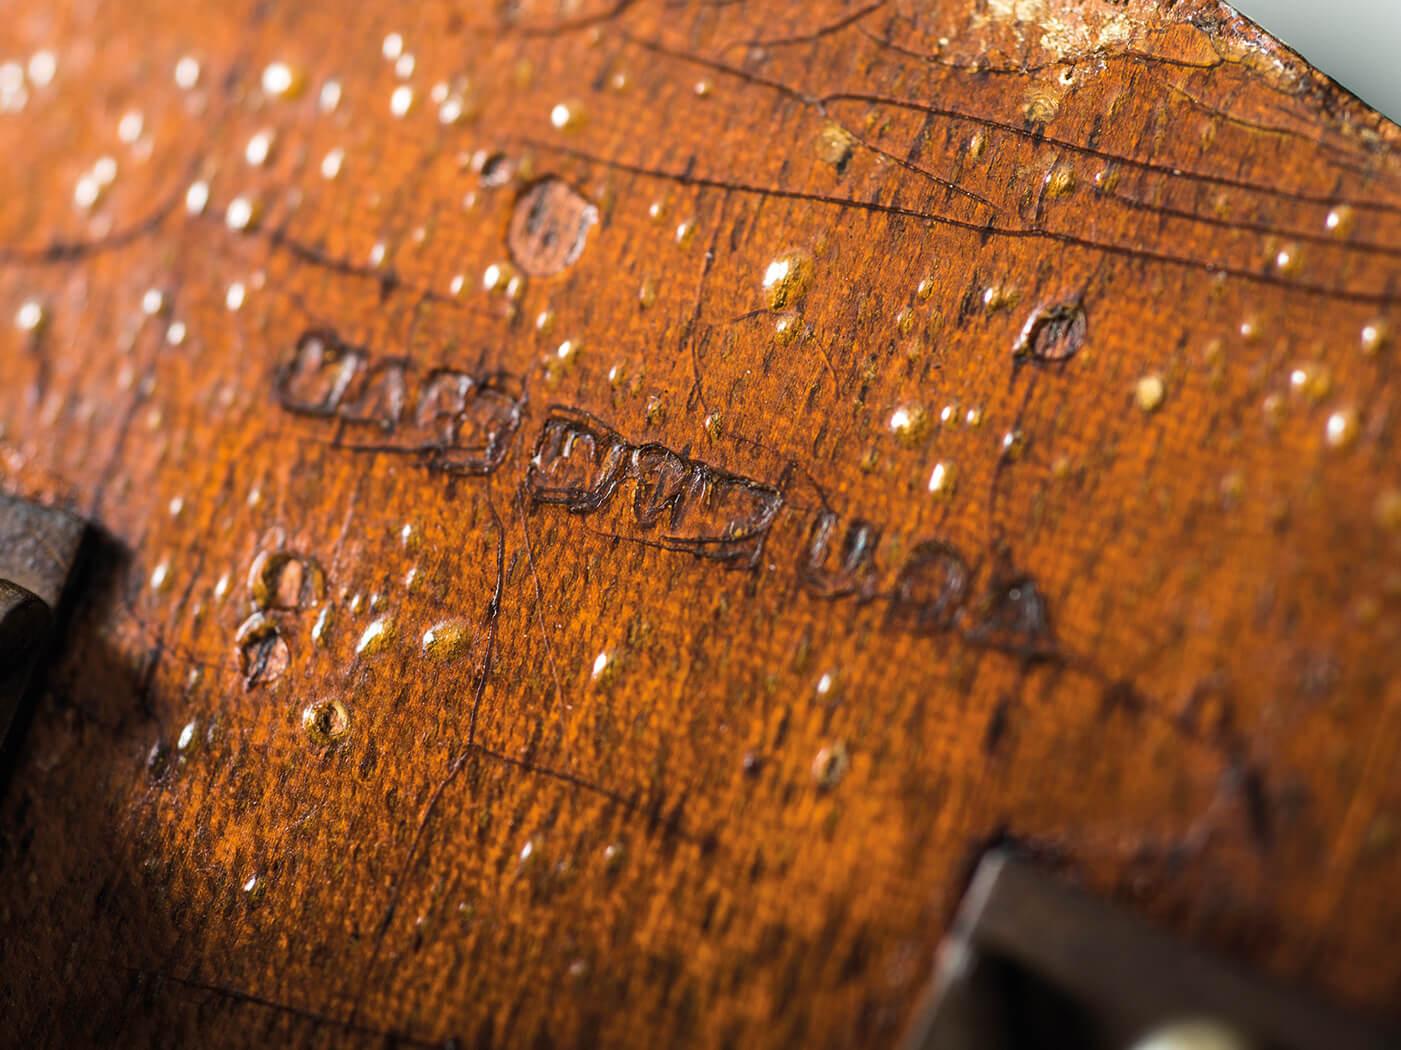 Kalamazoo KG-14 back of headstock engraving